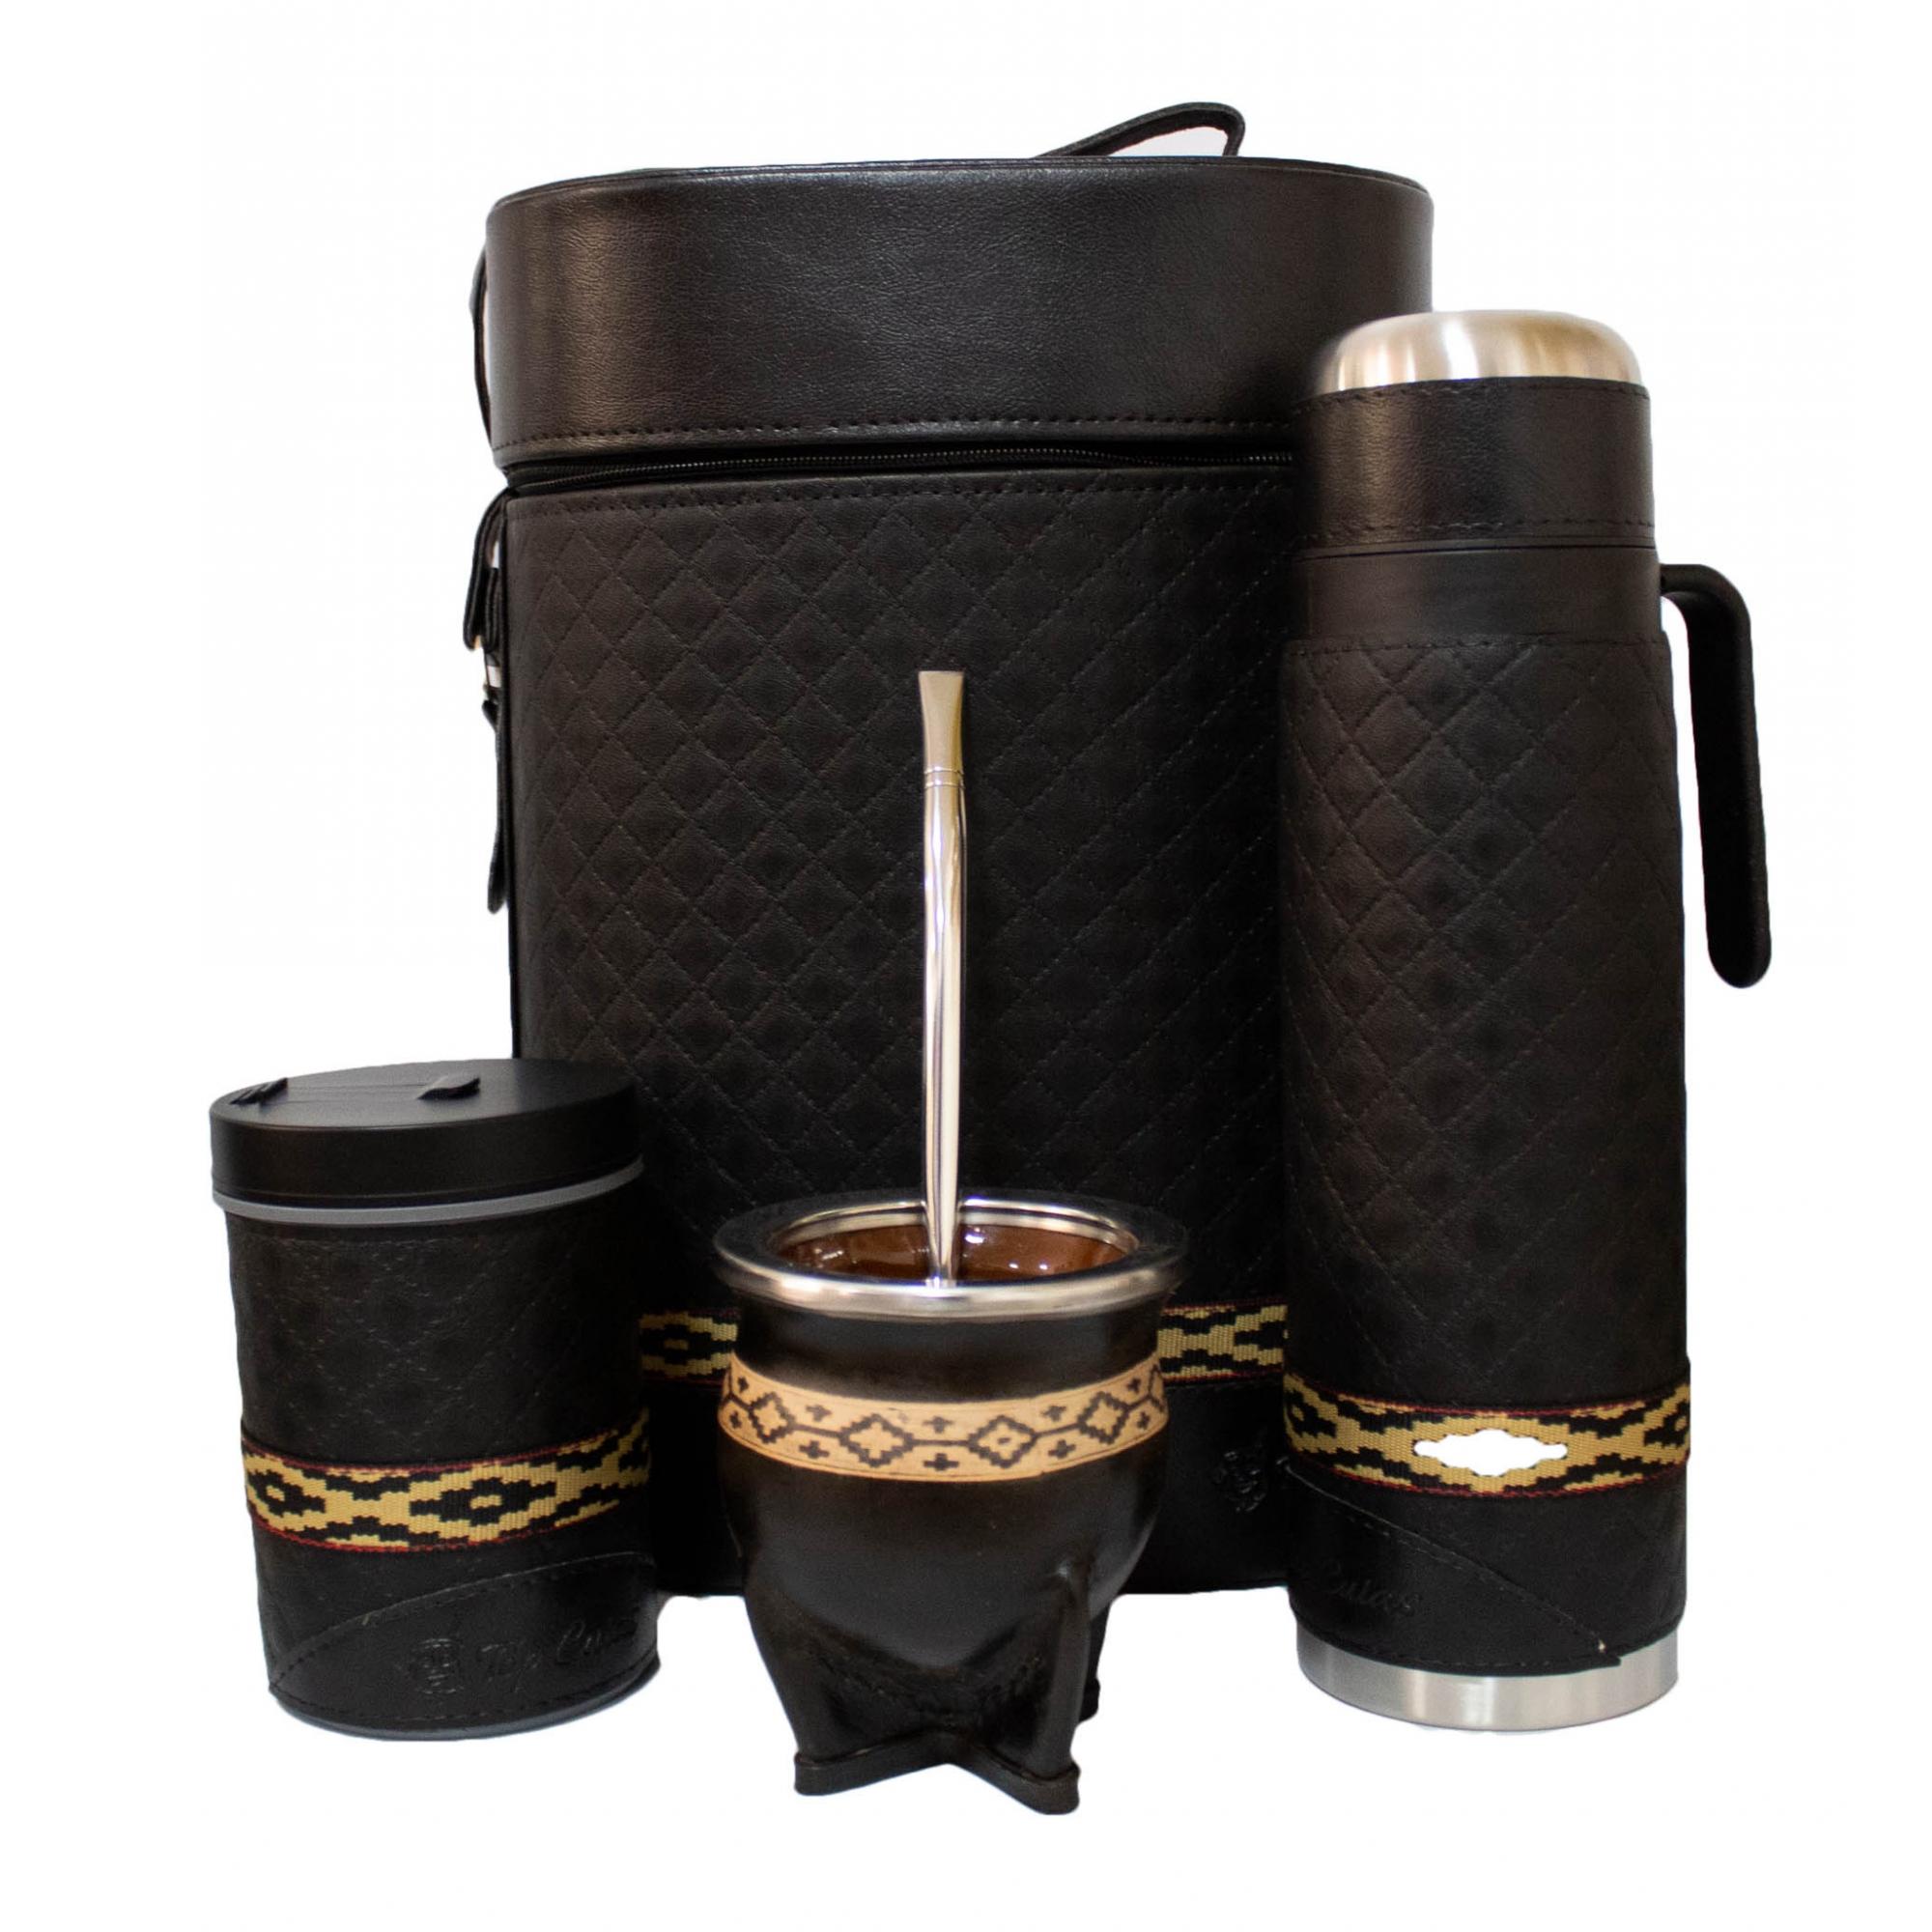 Conjunto chimarrão mateira 1 litro, térmica, cuia cerâmica, bomba inox e porta erva